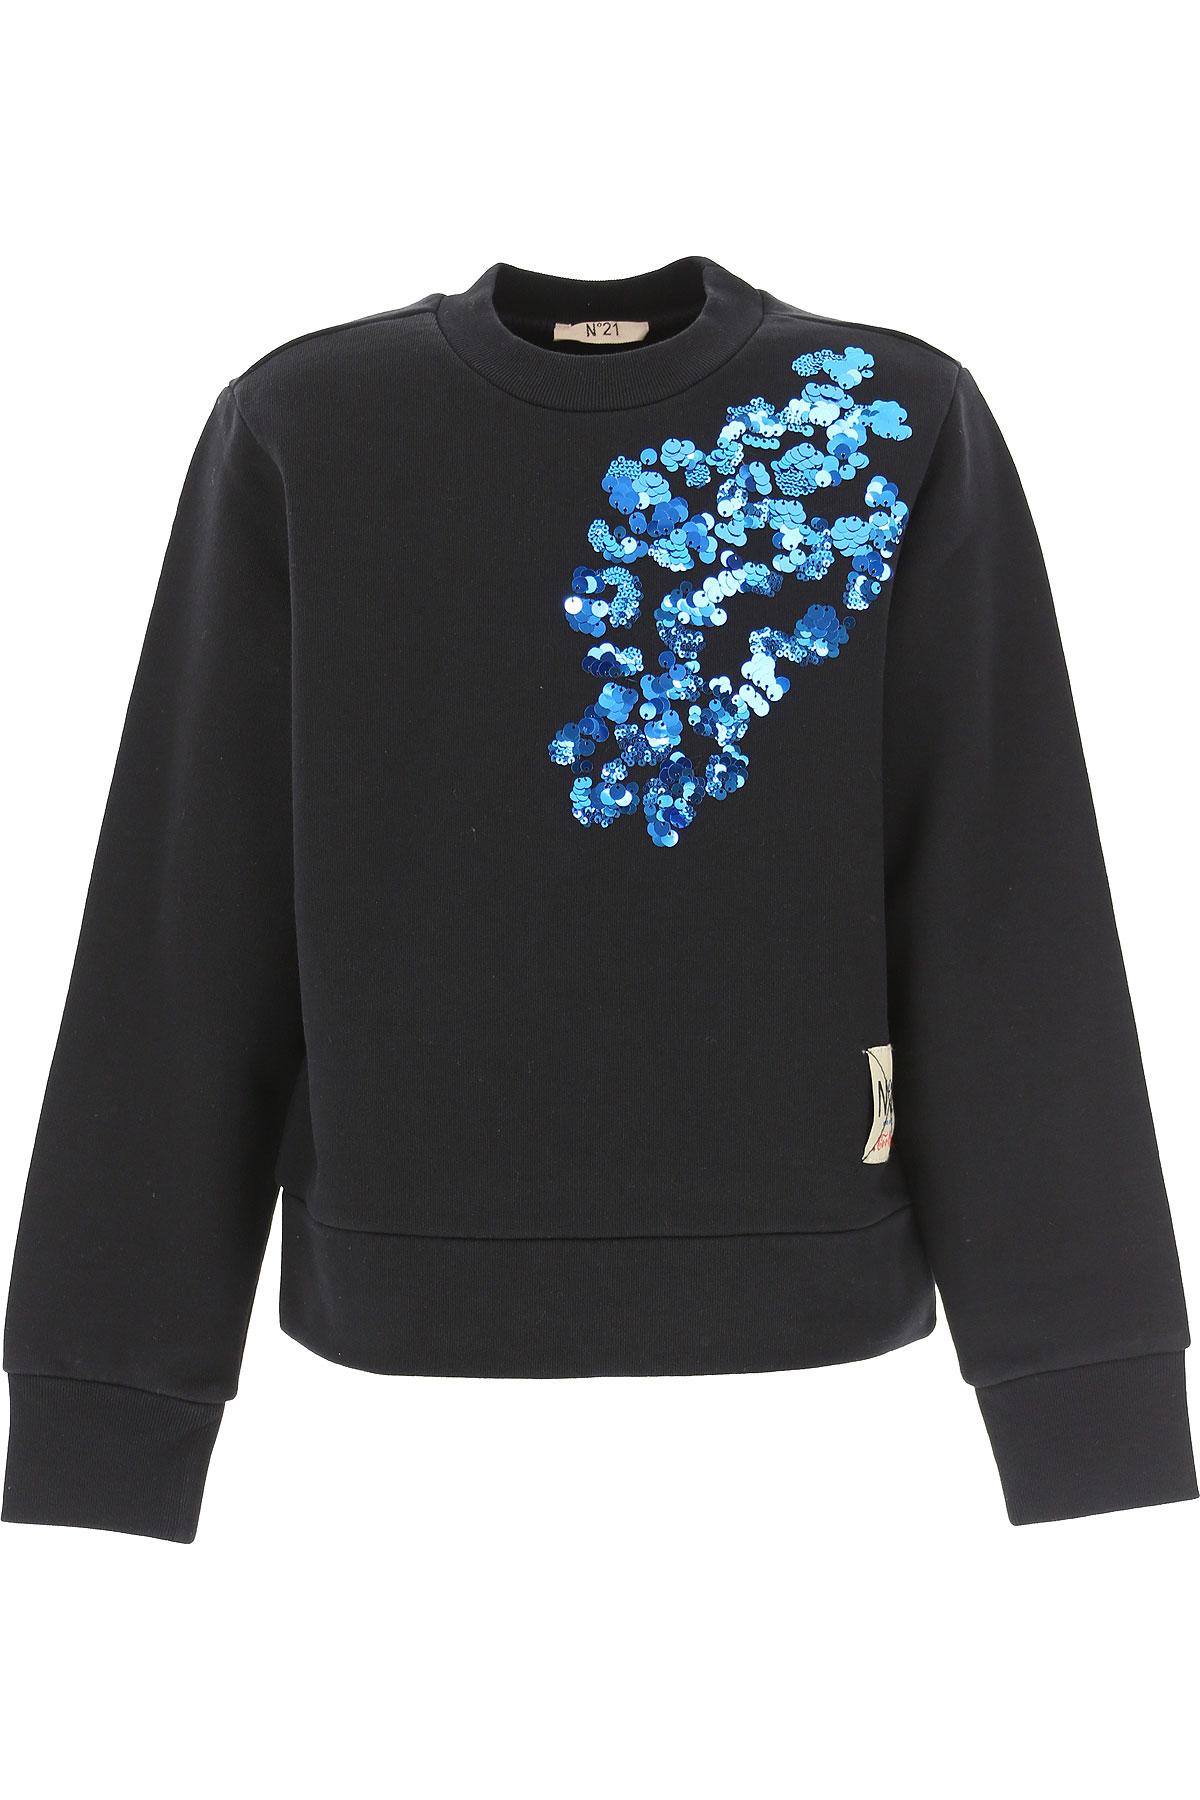 NO 21 Kids Sweatshirts & Hoodies for Girls On Sale, Black, Cotton, 2019, 10Y 12Y 14Y 4Y 6Y 8Y